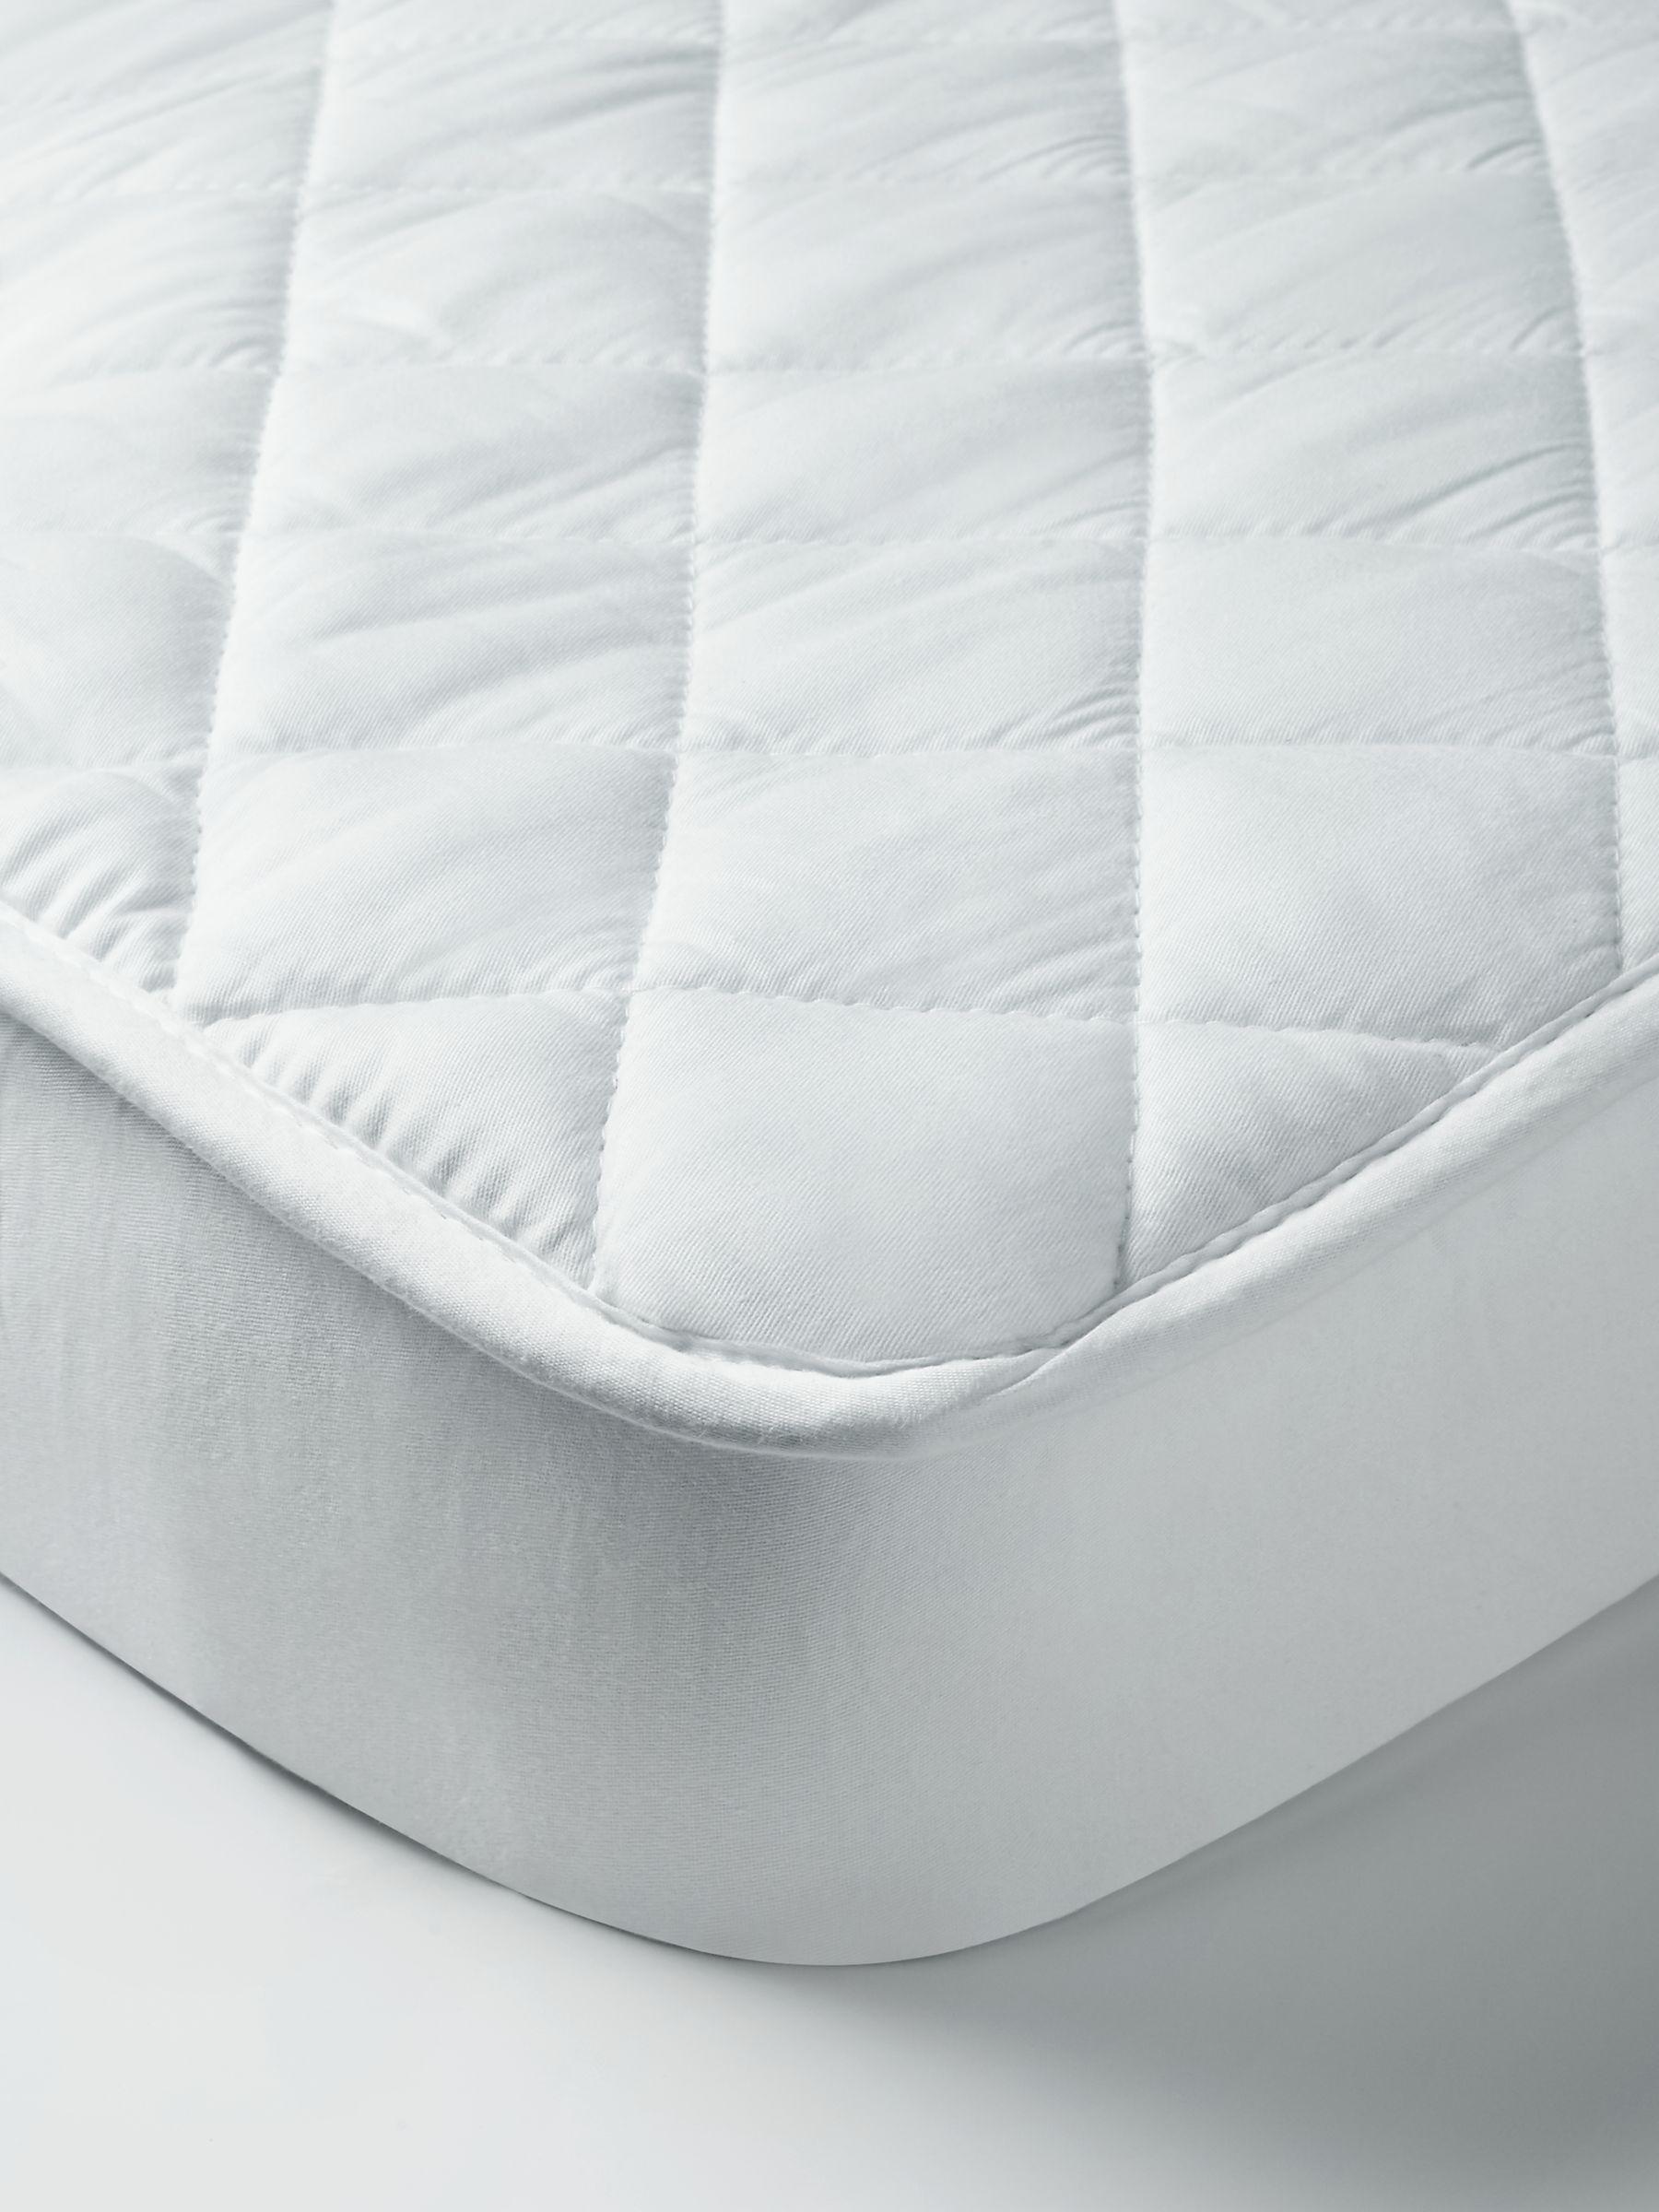 John Lewis & Partners Micro-Fresh Cotton Cot Mattress Protector